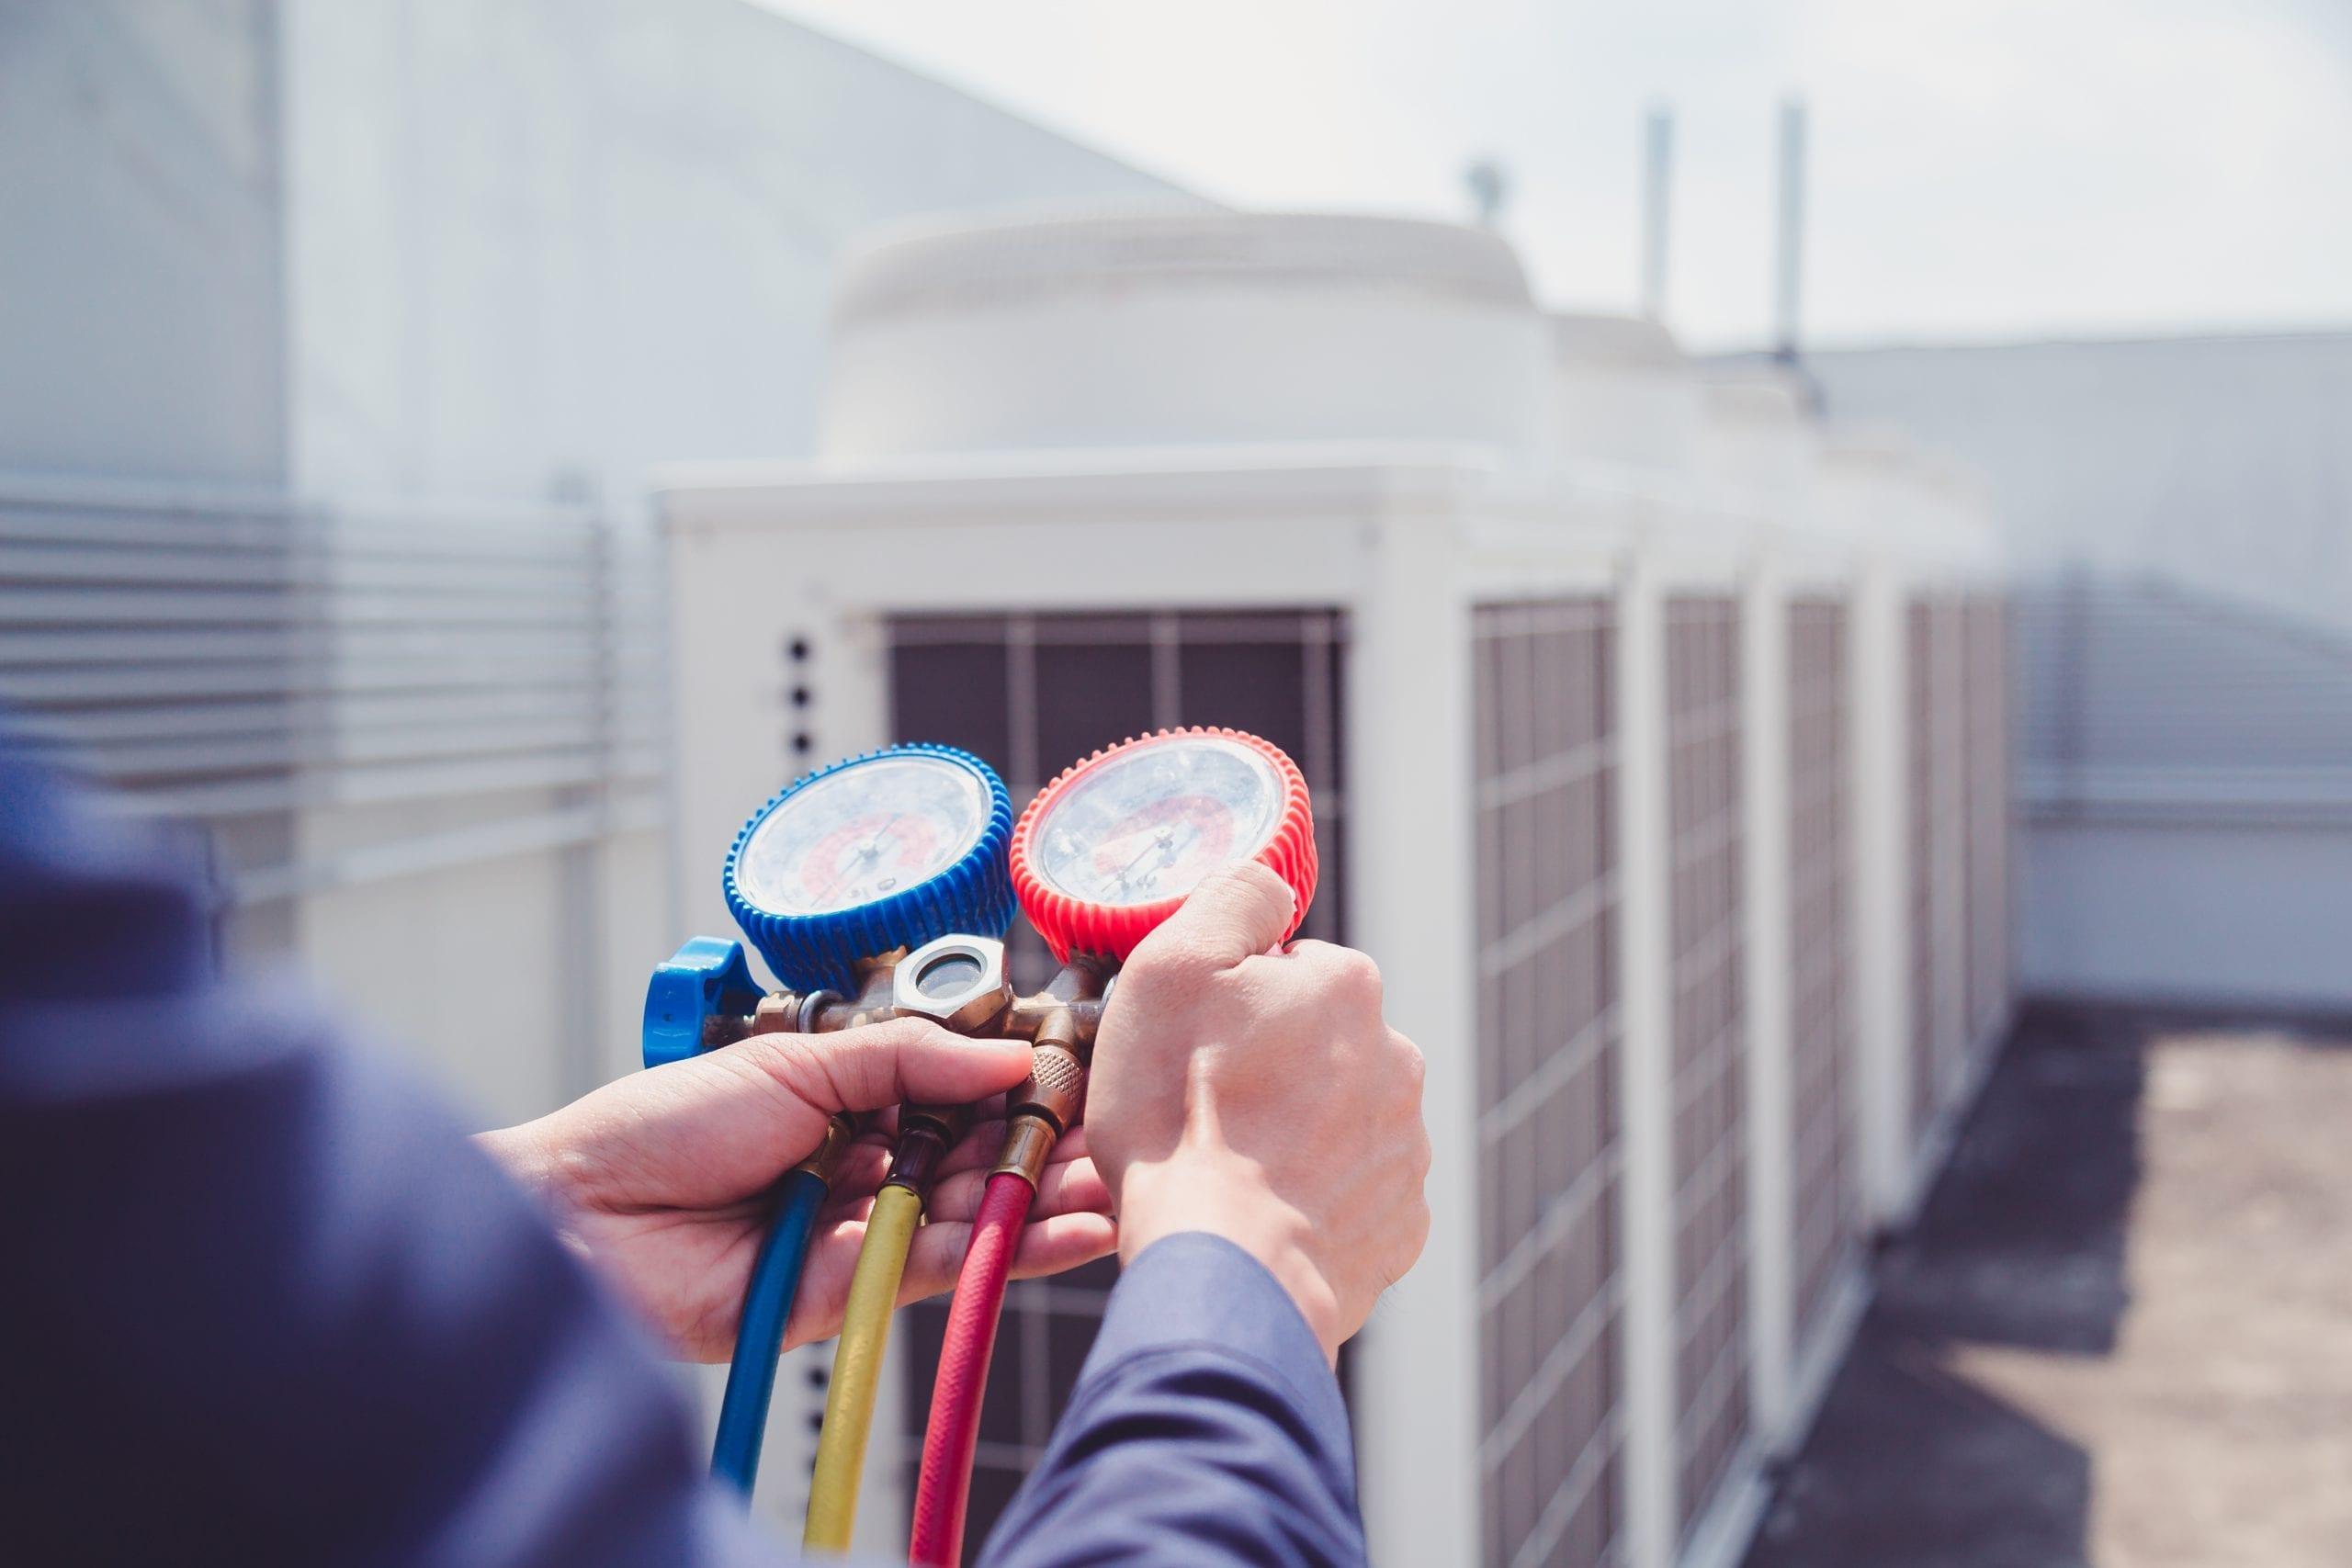 Gasmeting van airconditioning systeem op dak